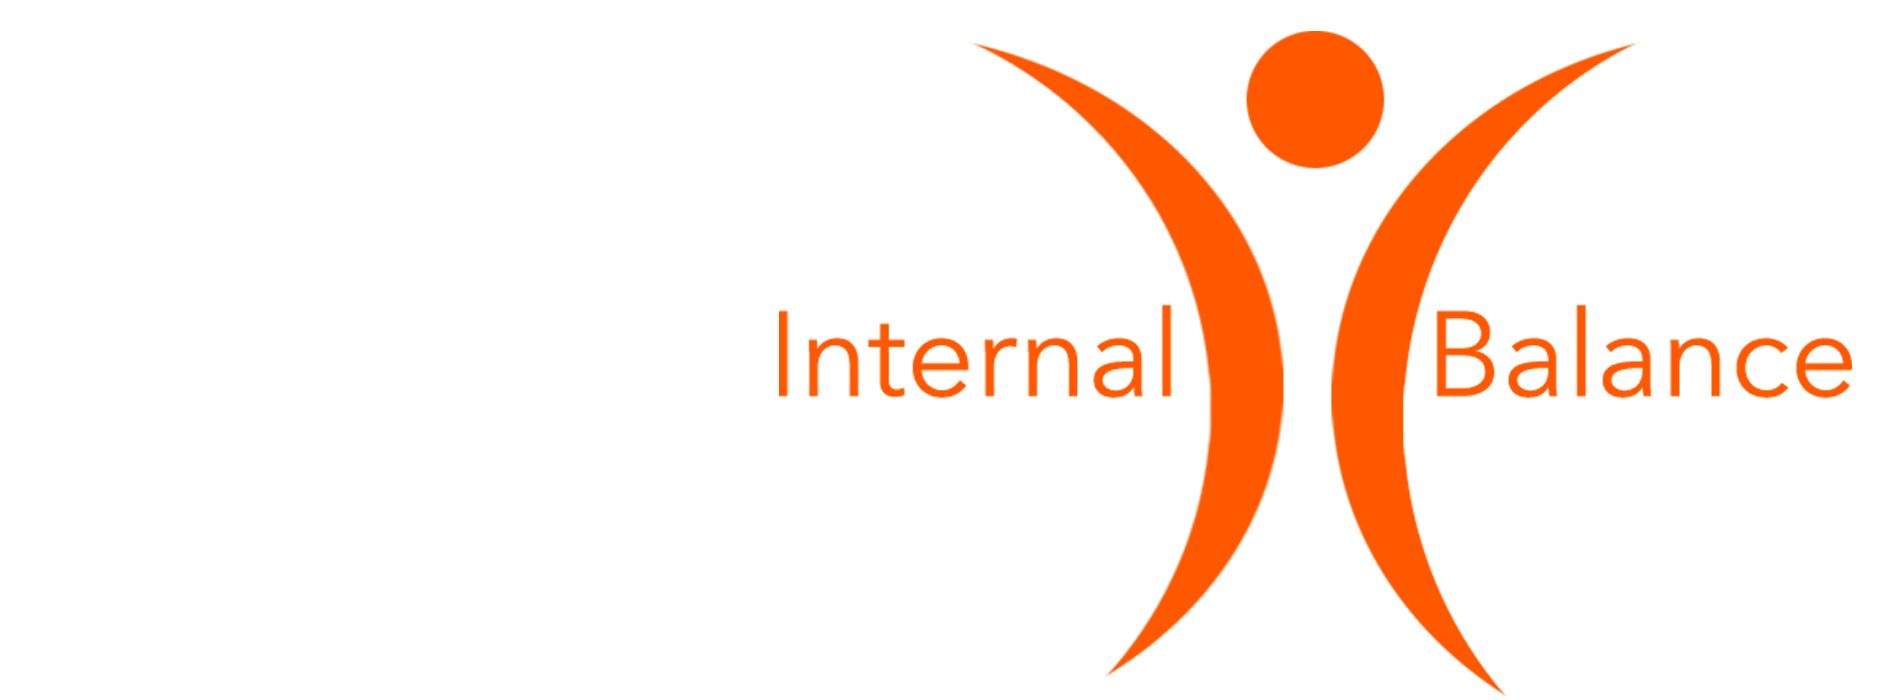 Internal Balance